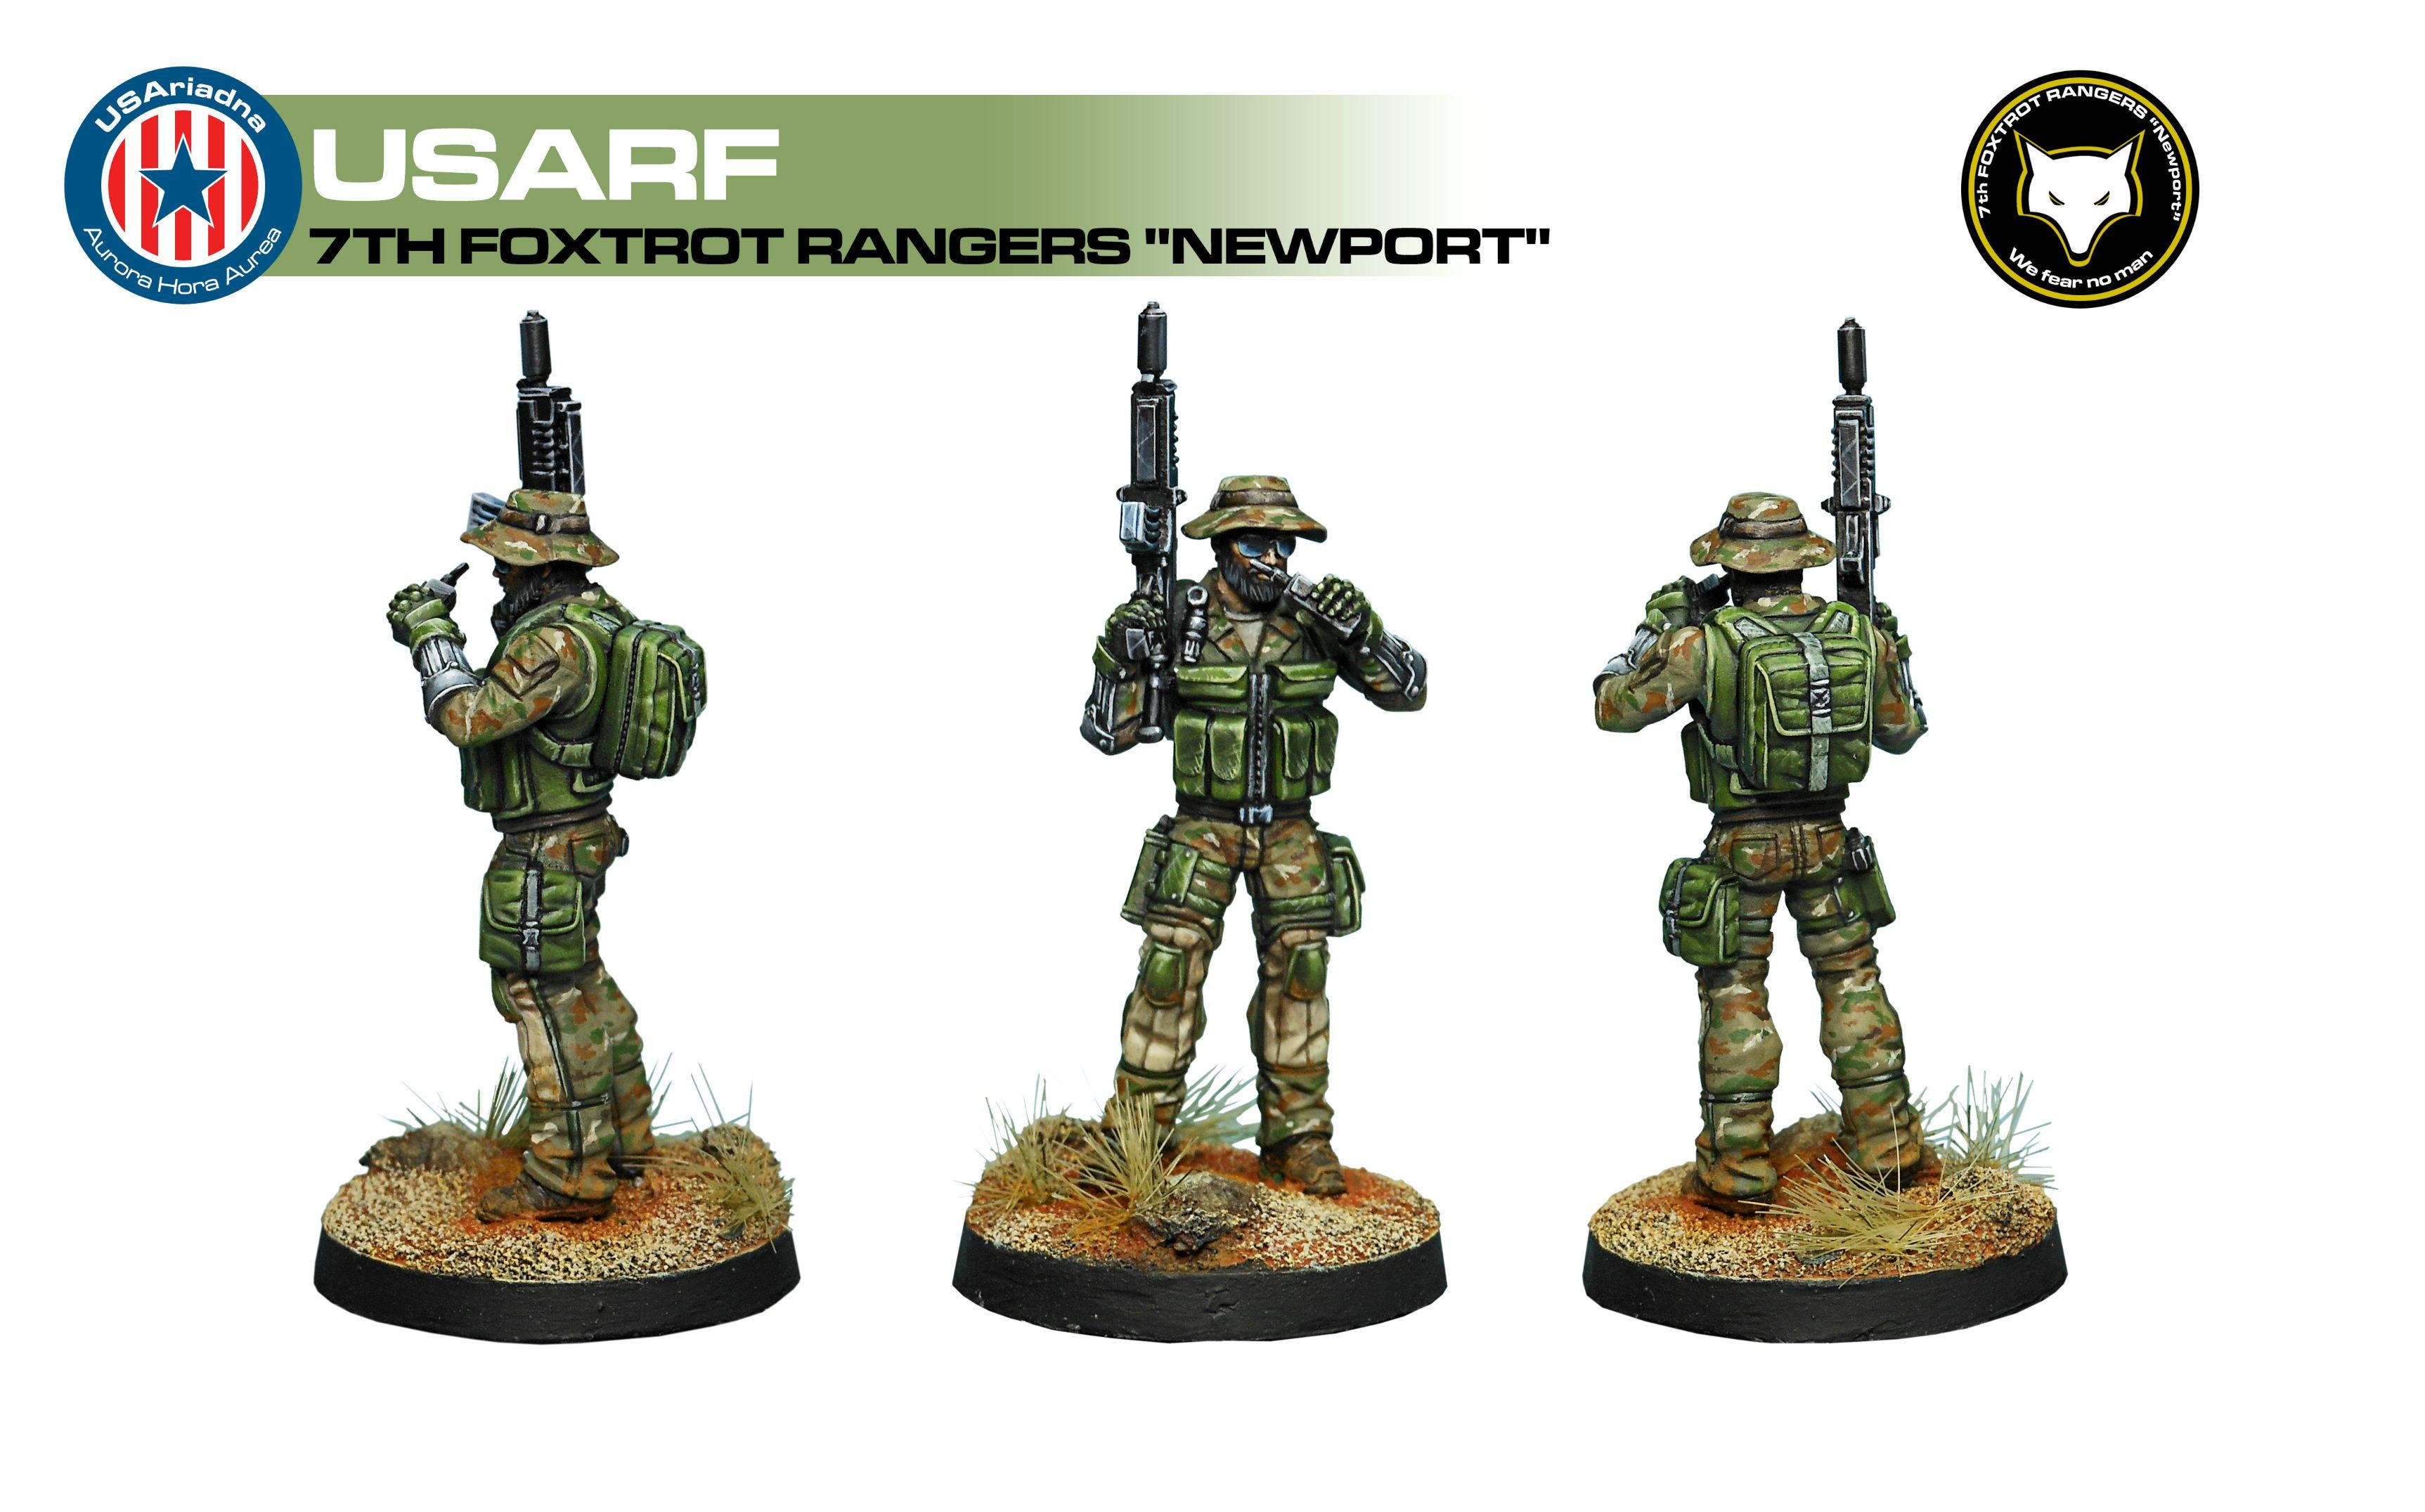 011 USAriadna Foxtrot Ranger